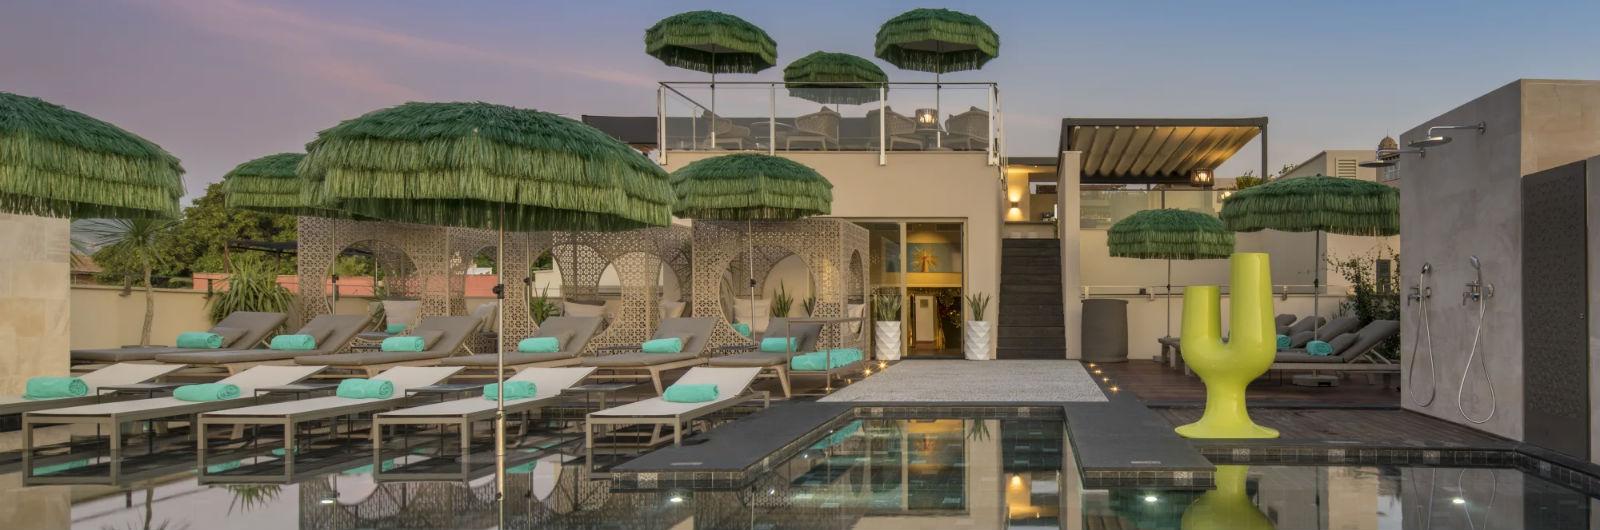 Luxury Suites, Fresh Seafood and Palma's Longest Infinity Pool